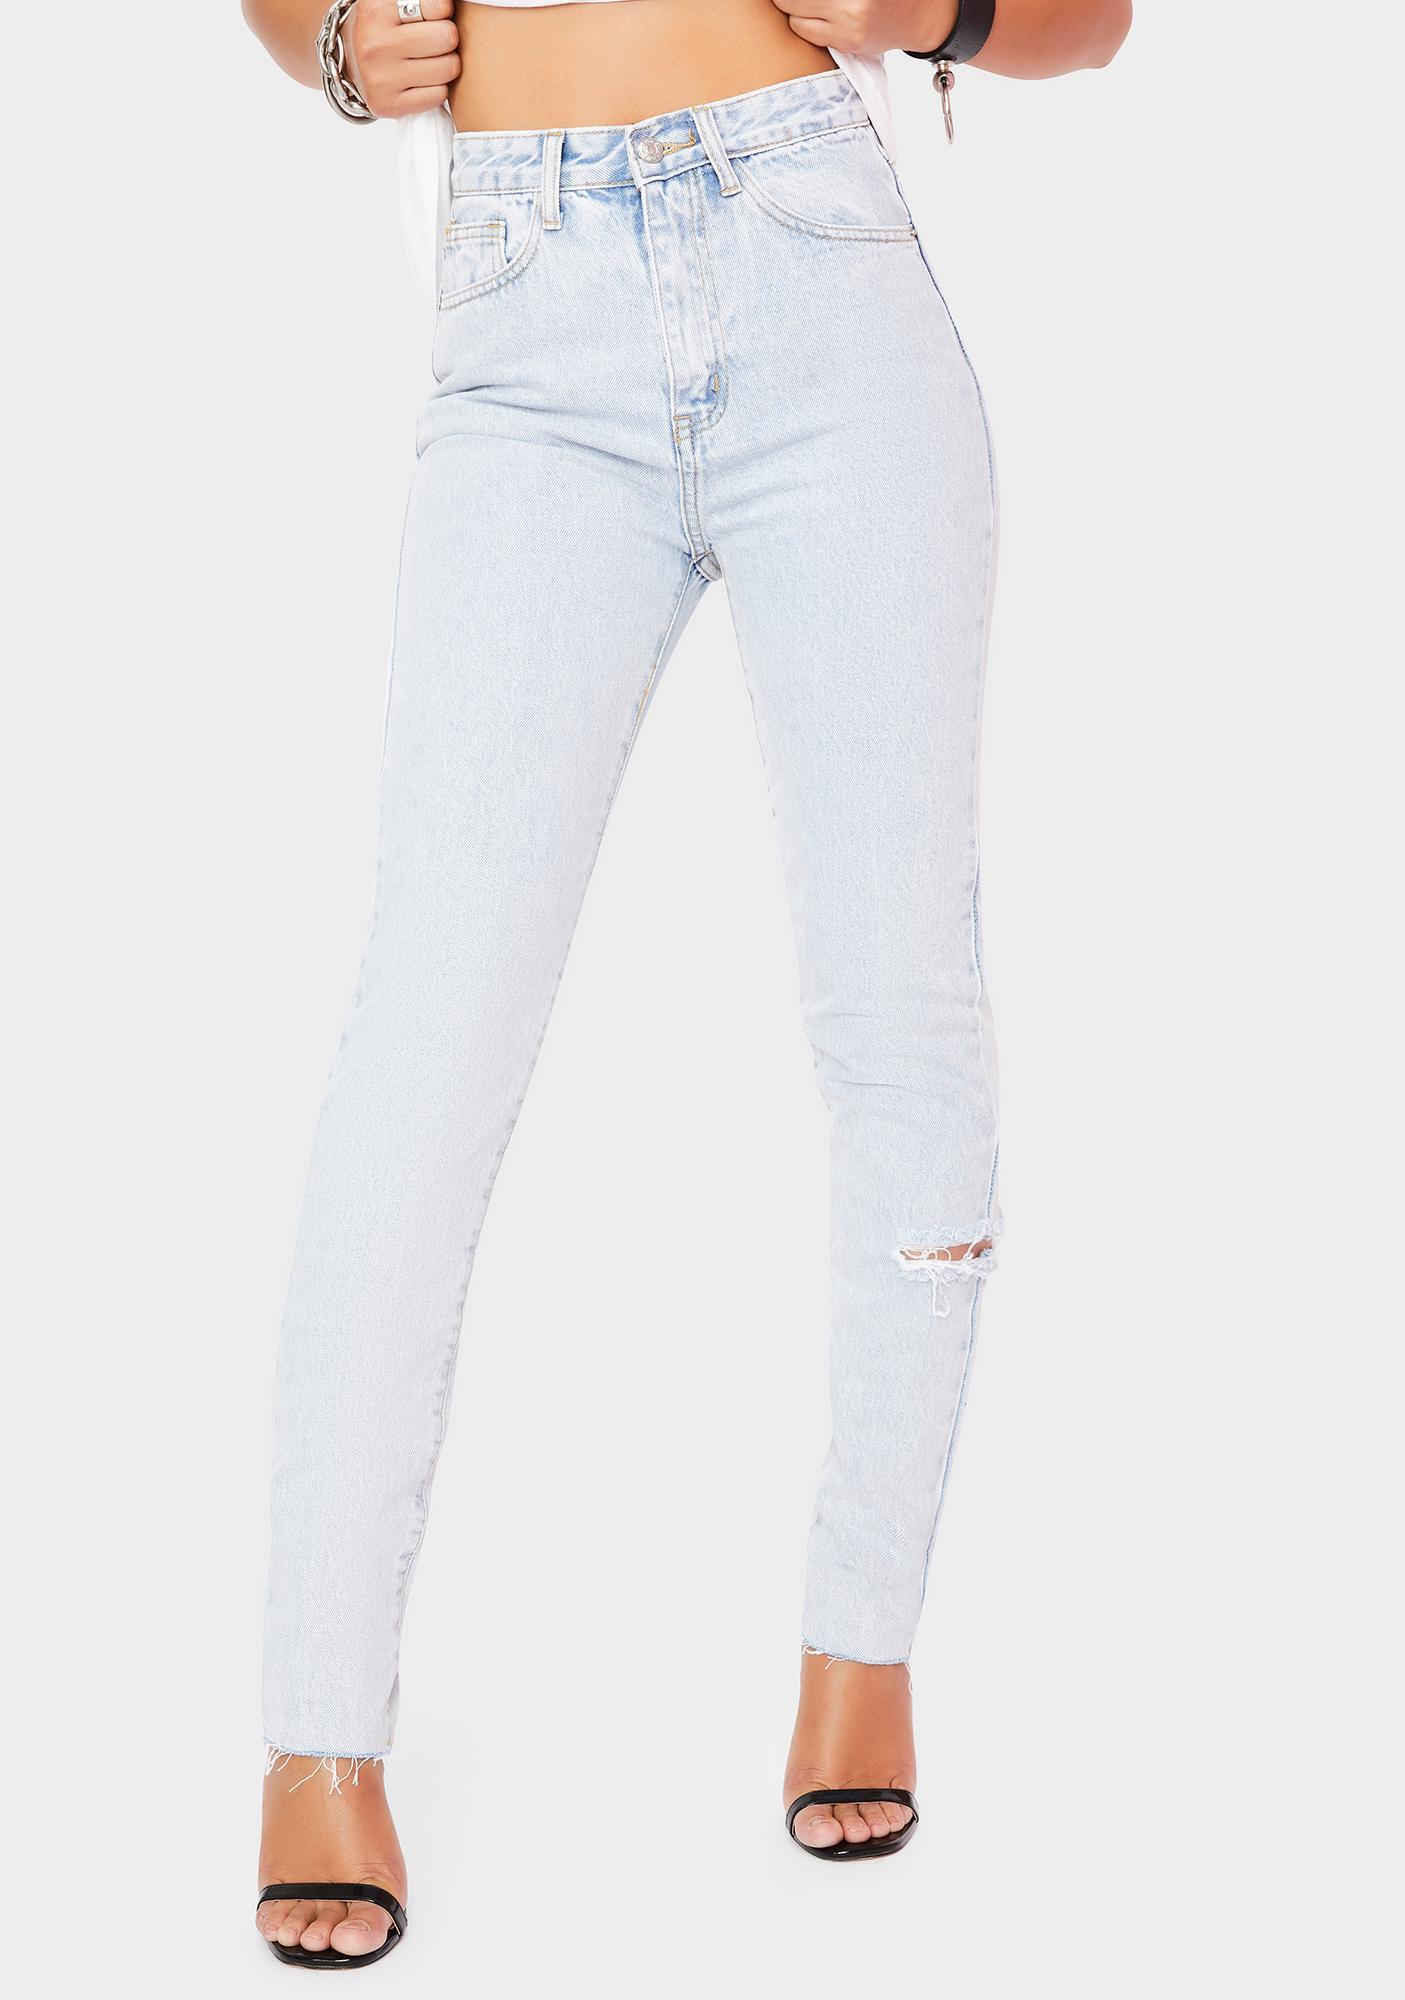 Momokrom Light Wash Side Rip Straight Leg Jeans